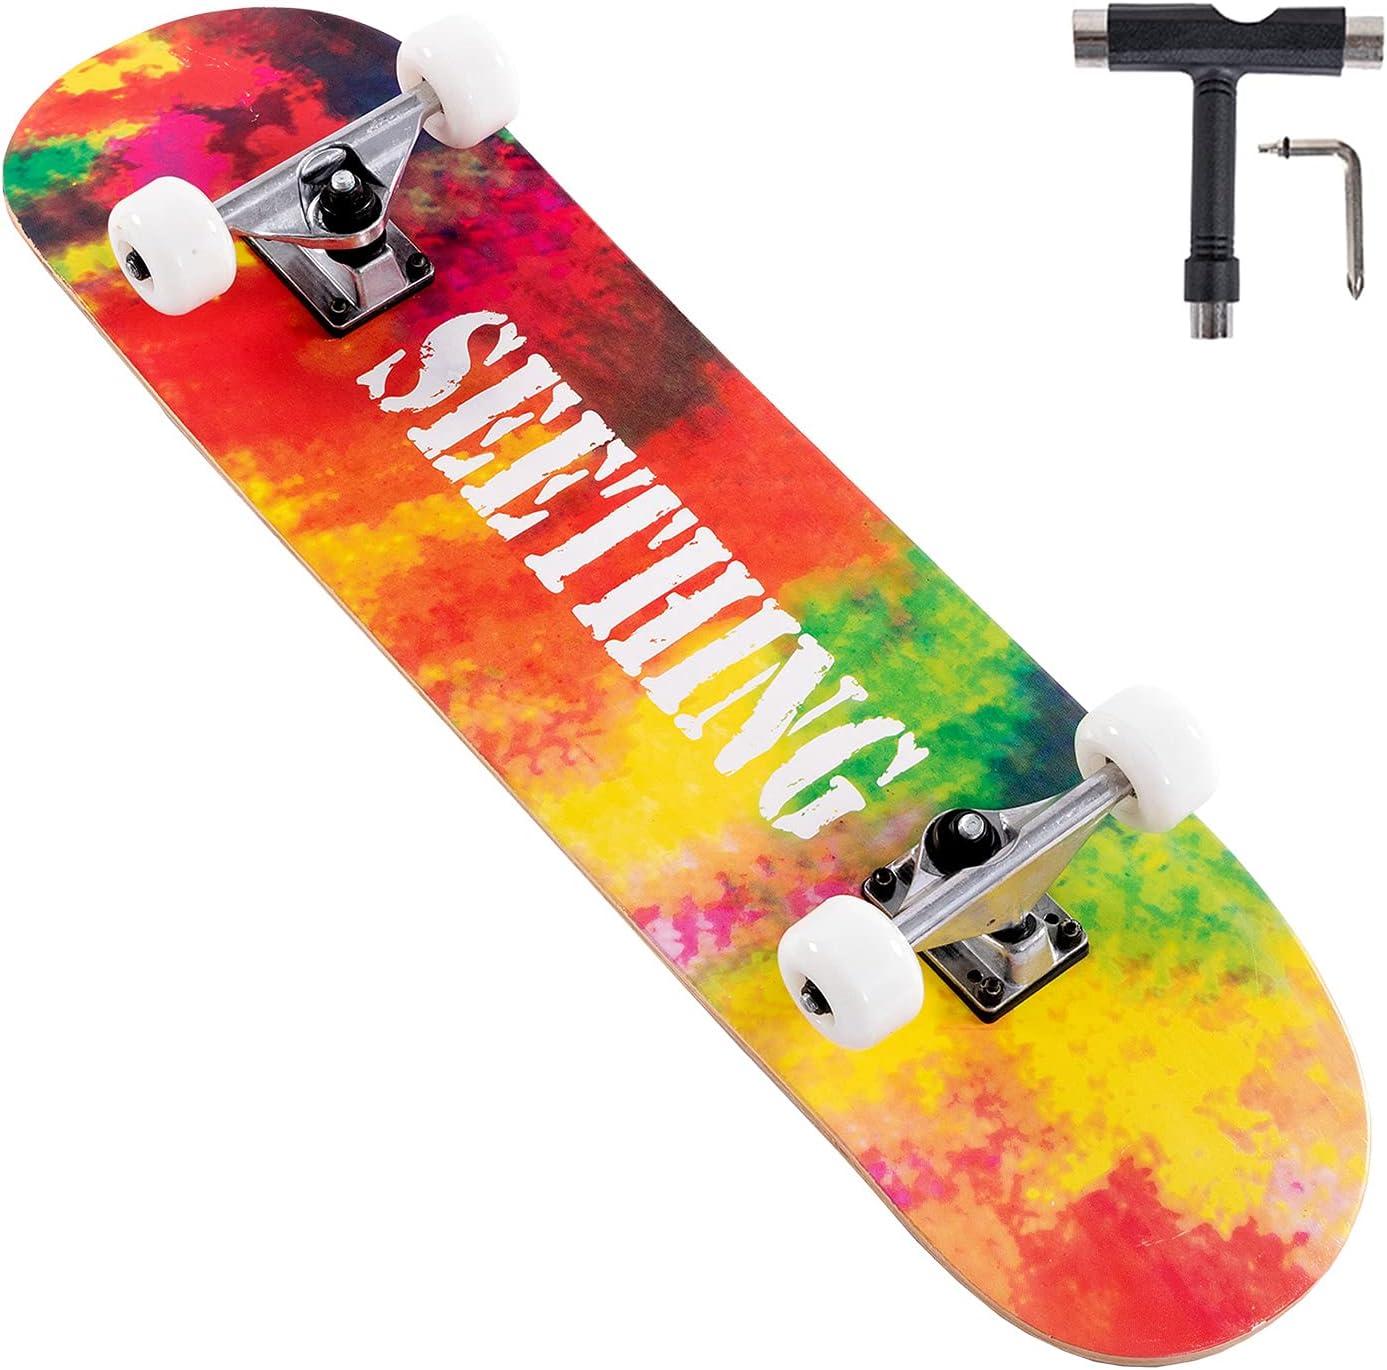 Lamberia 31 Max 68% OFF Inch Popular overseas Skateboards Complete Skateboard for Boys Girls